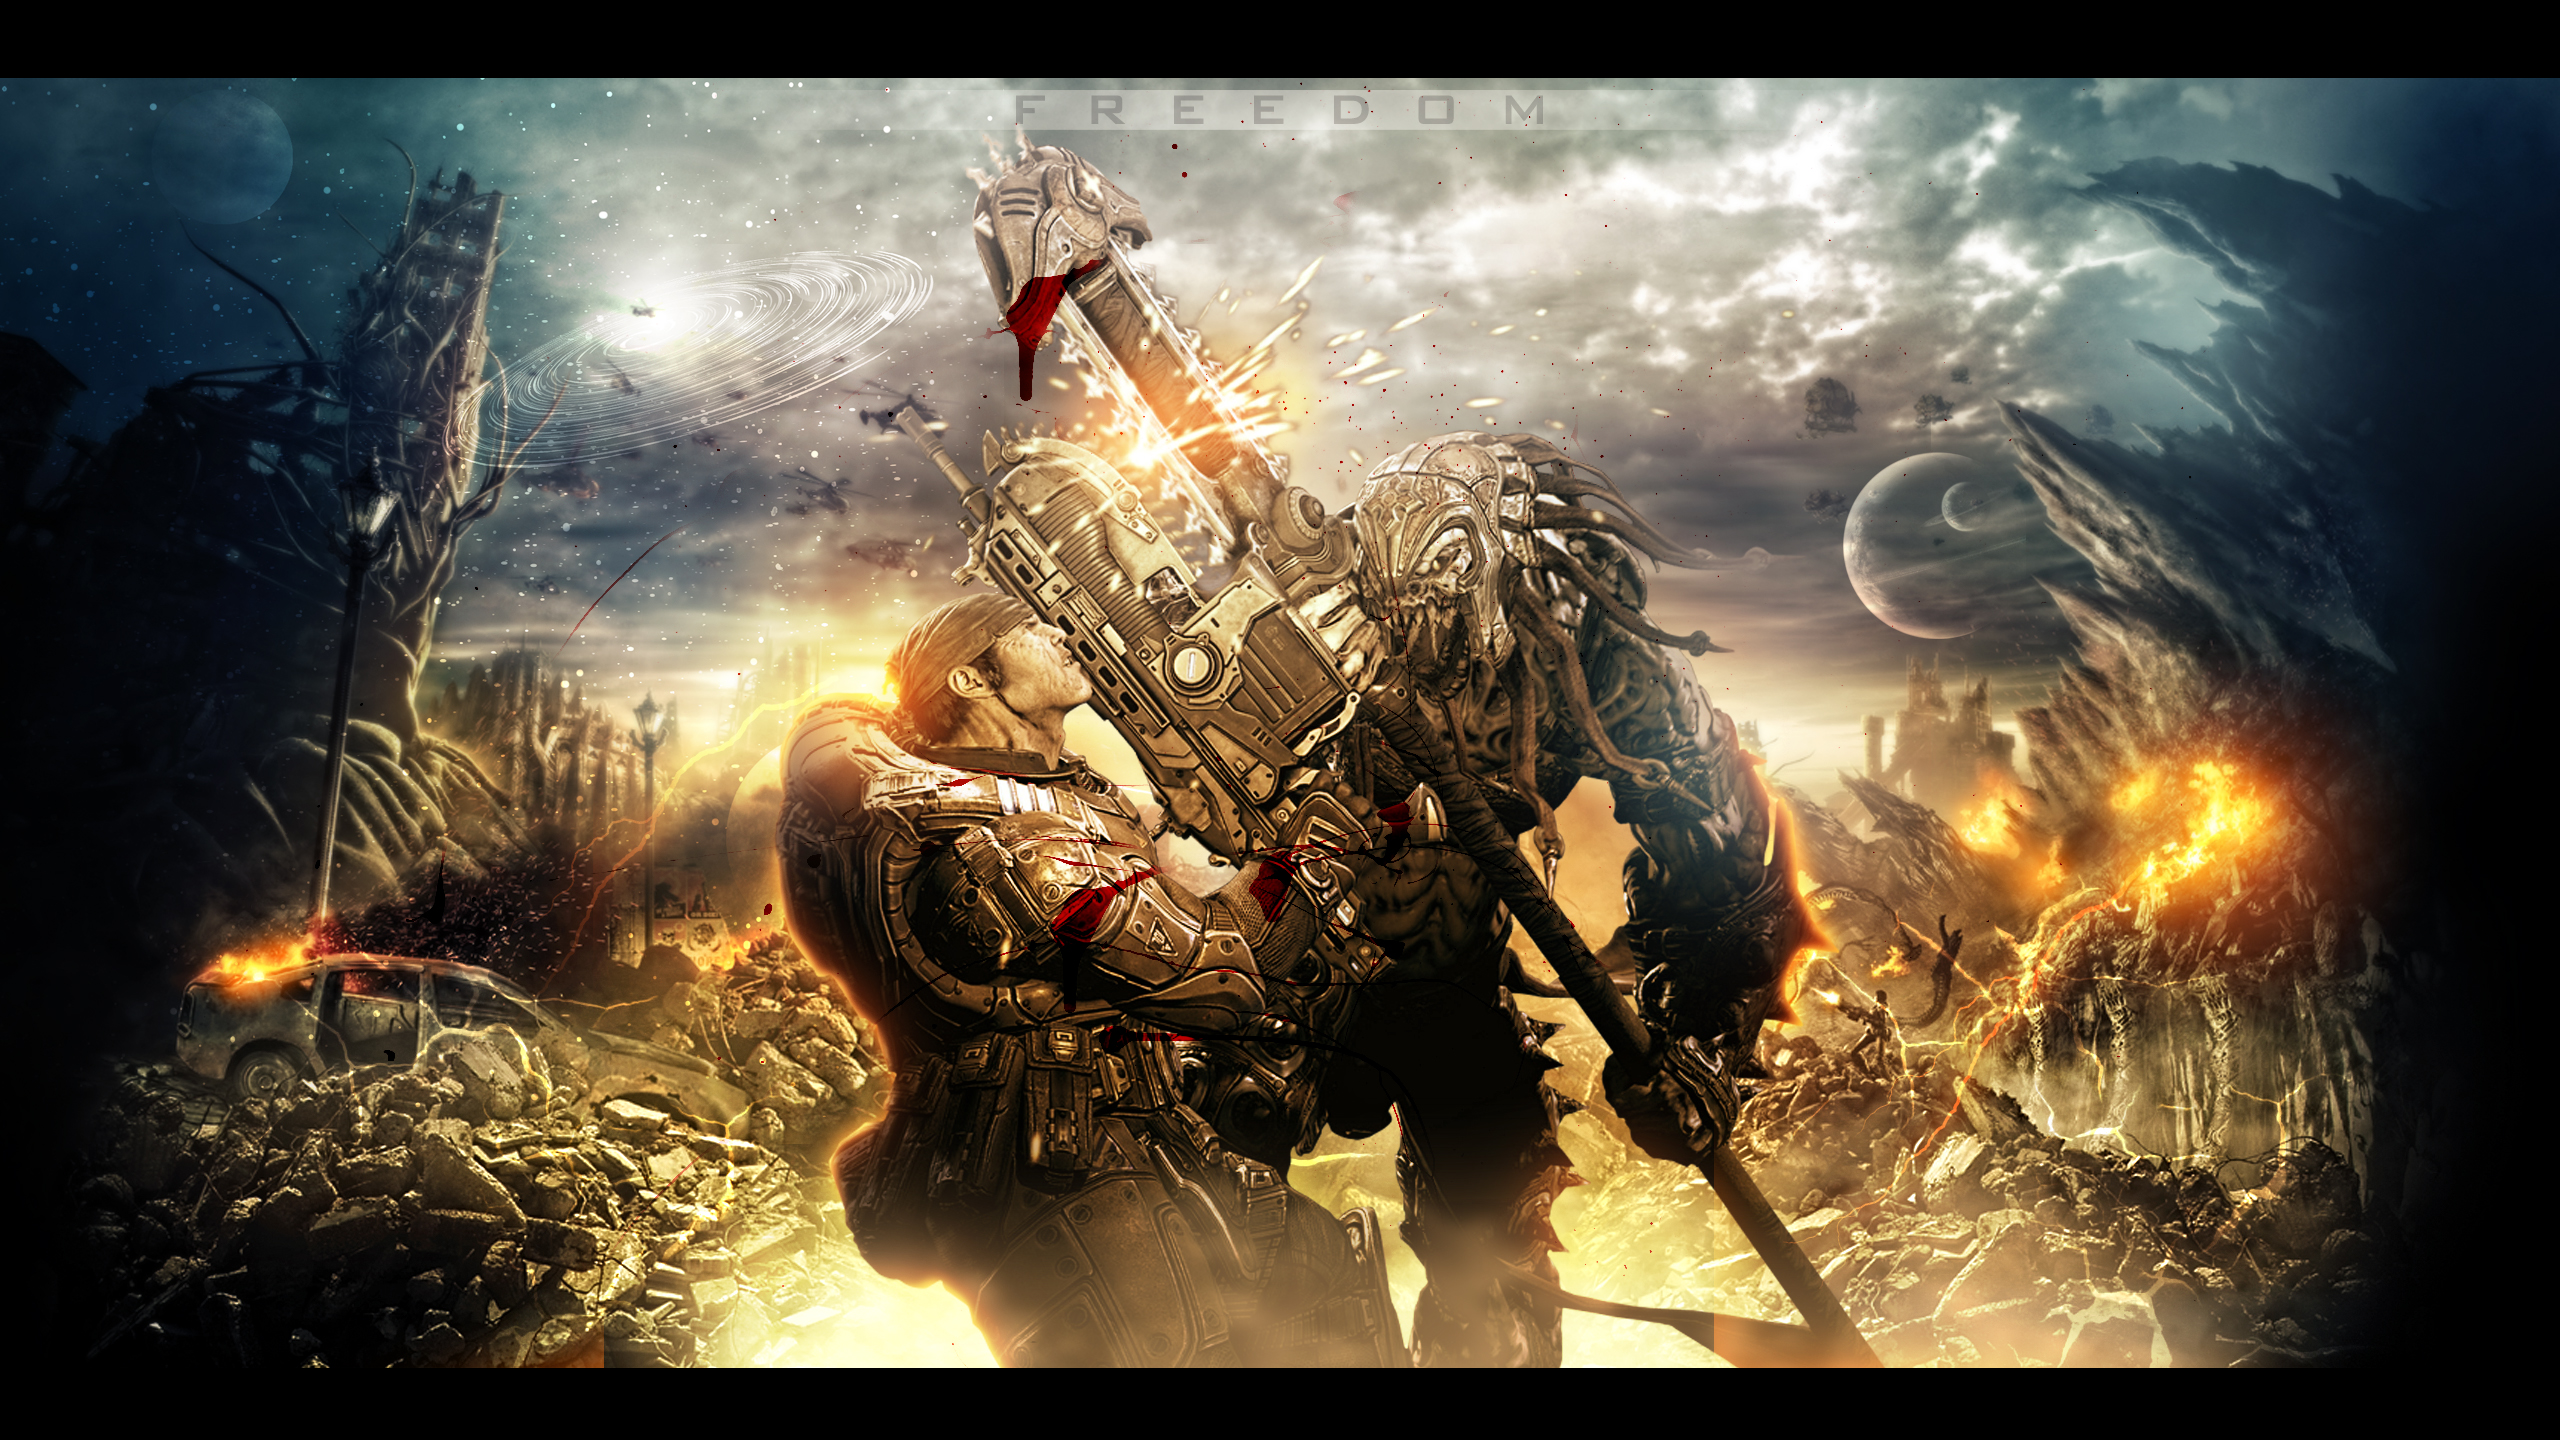 Gears Of War Wallpapers 2560x1440, - HD Wallpaper